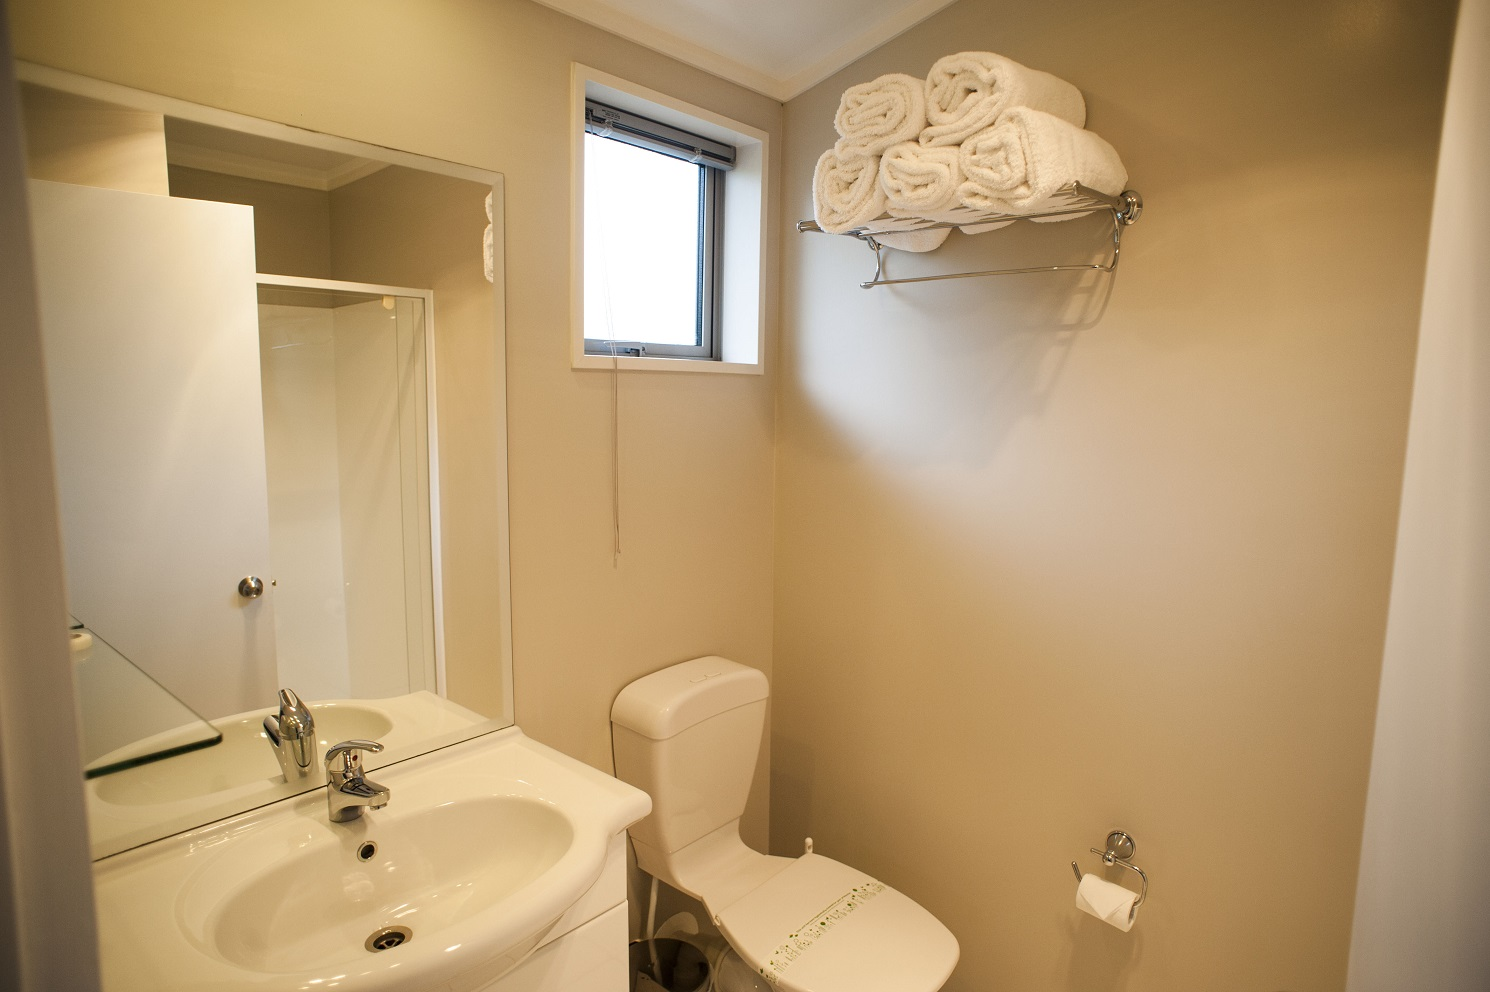 Christchurch luxury apartment qualmark 5 star 1 bedroom for 1 bedroom 1 bathroom